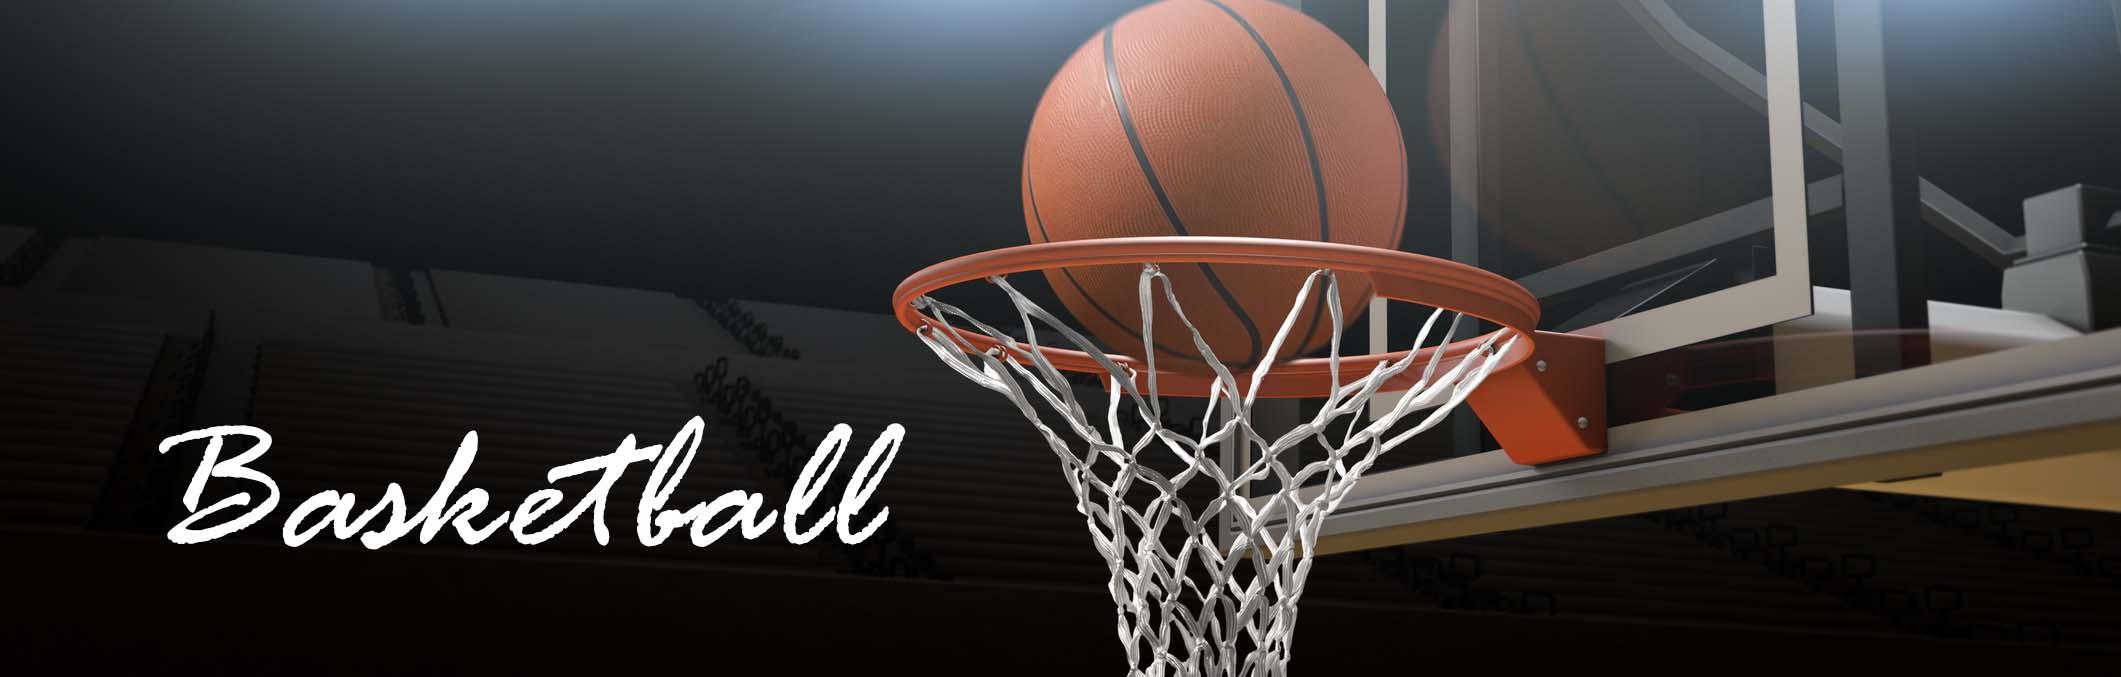 Basketball Basketball Escape Room Details Big Escape Rooms